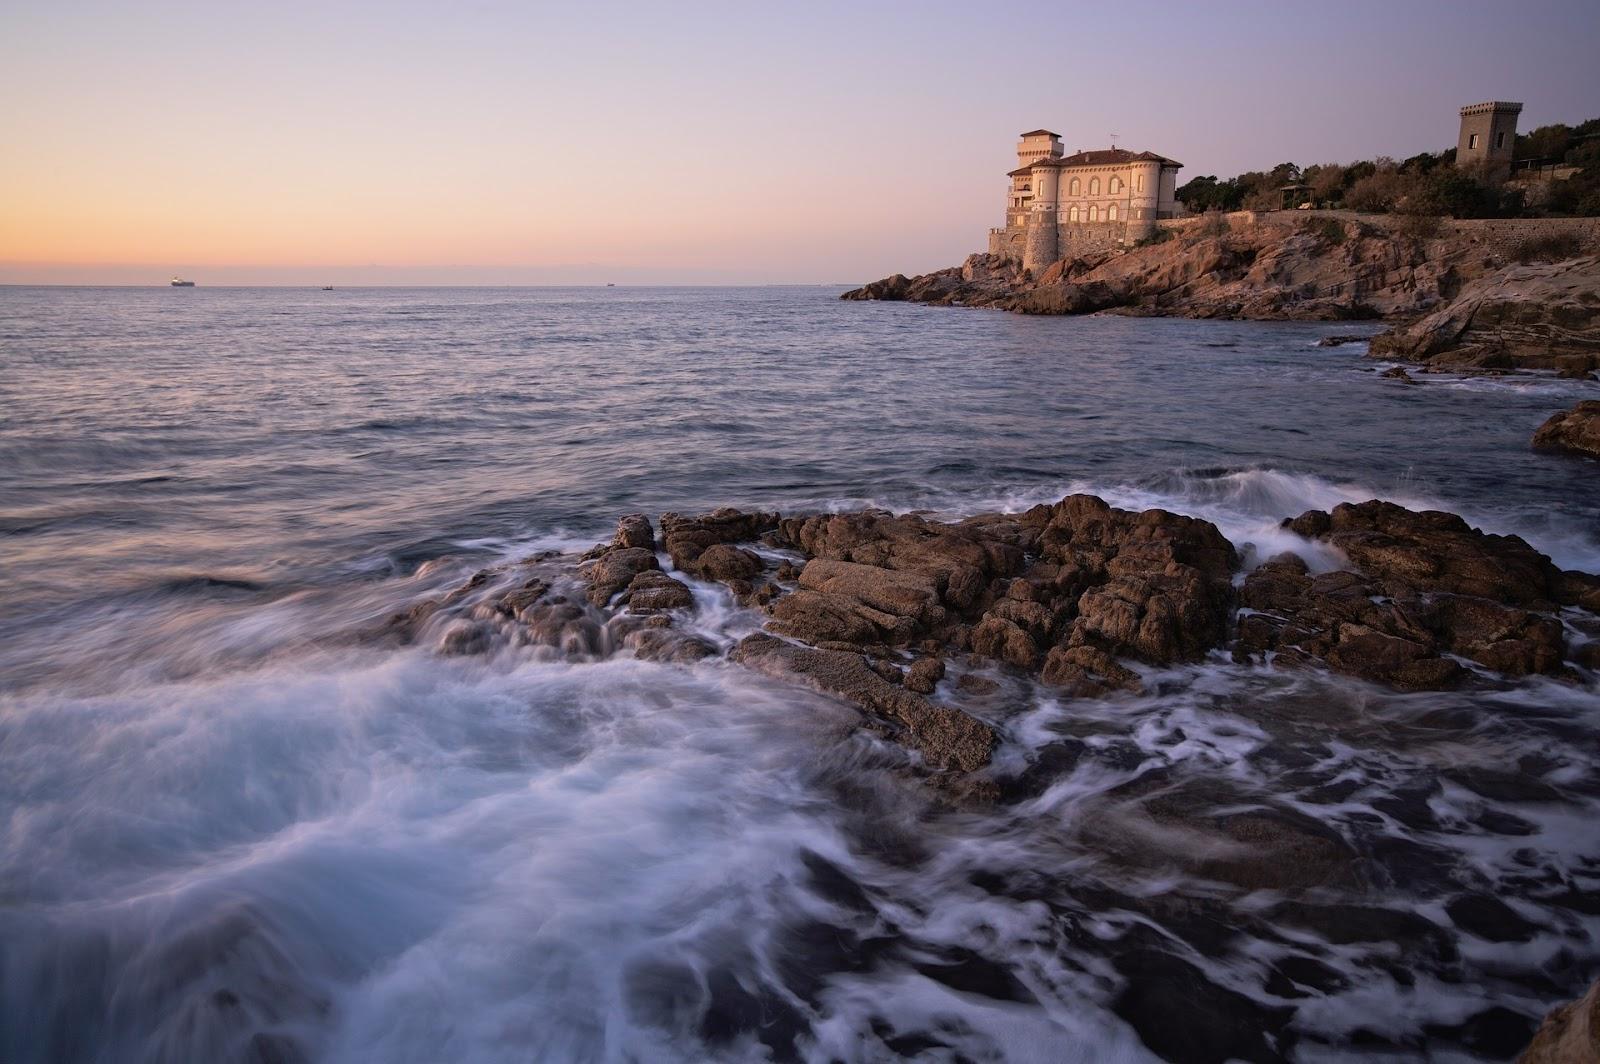 rocks on livorno coast calm sea and coastside building during sunset in tuscany italy